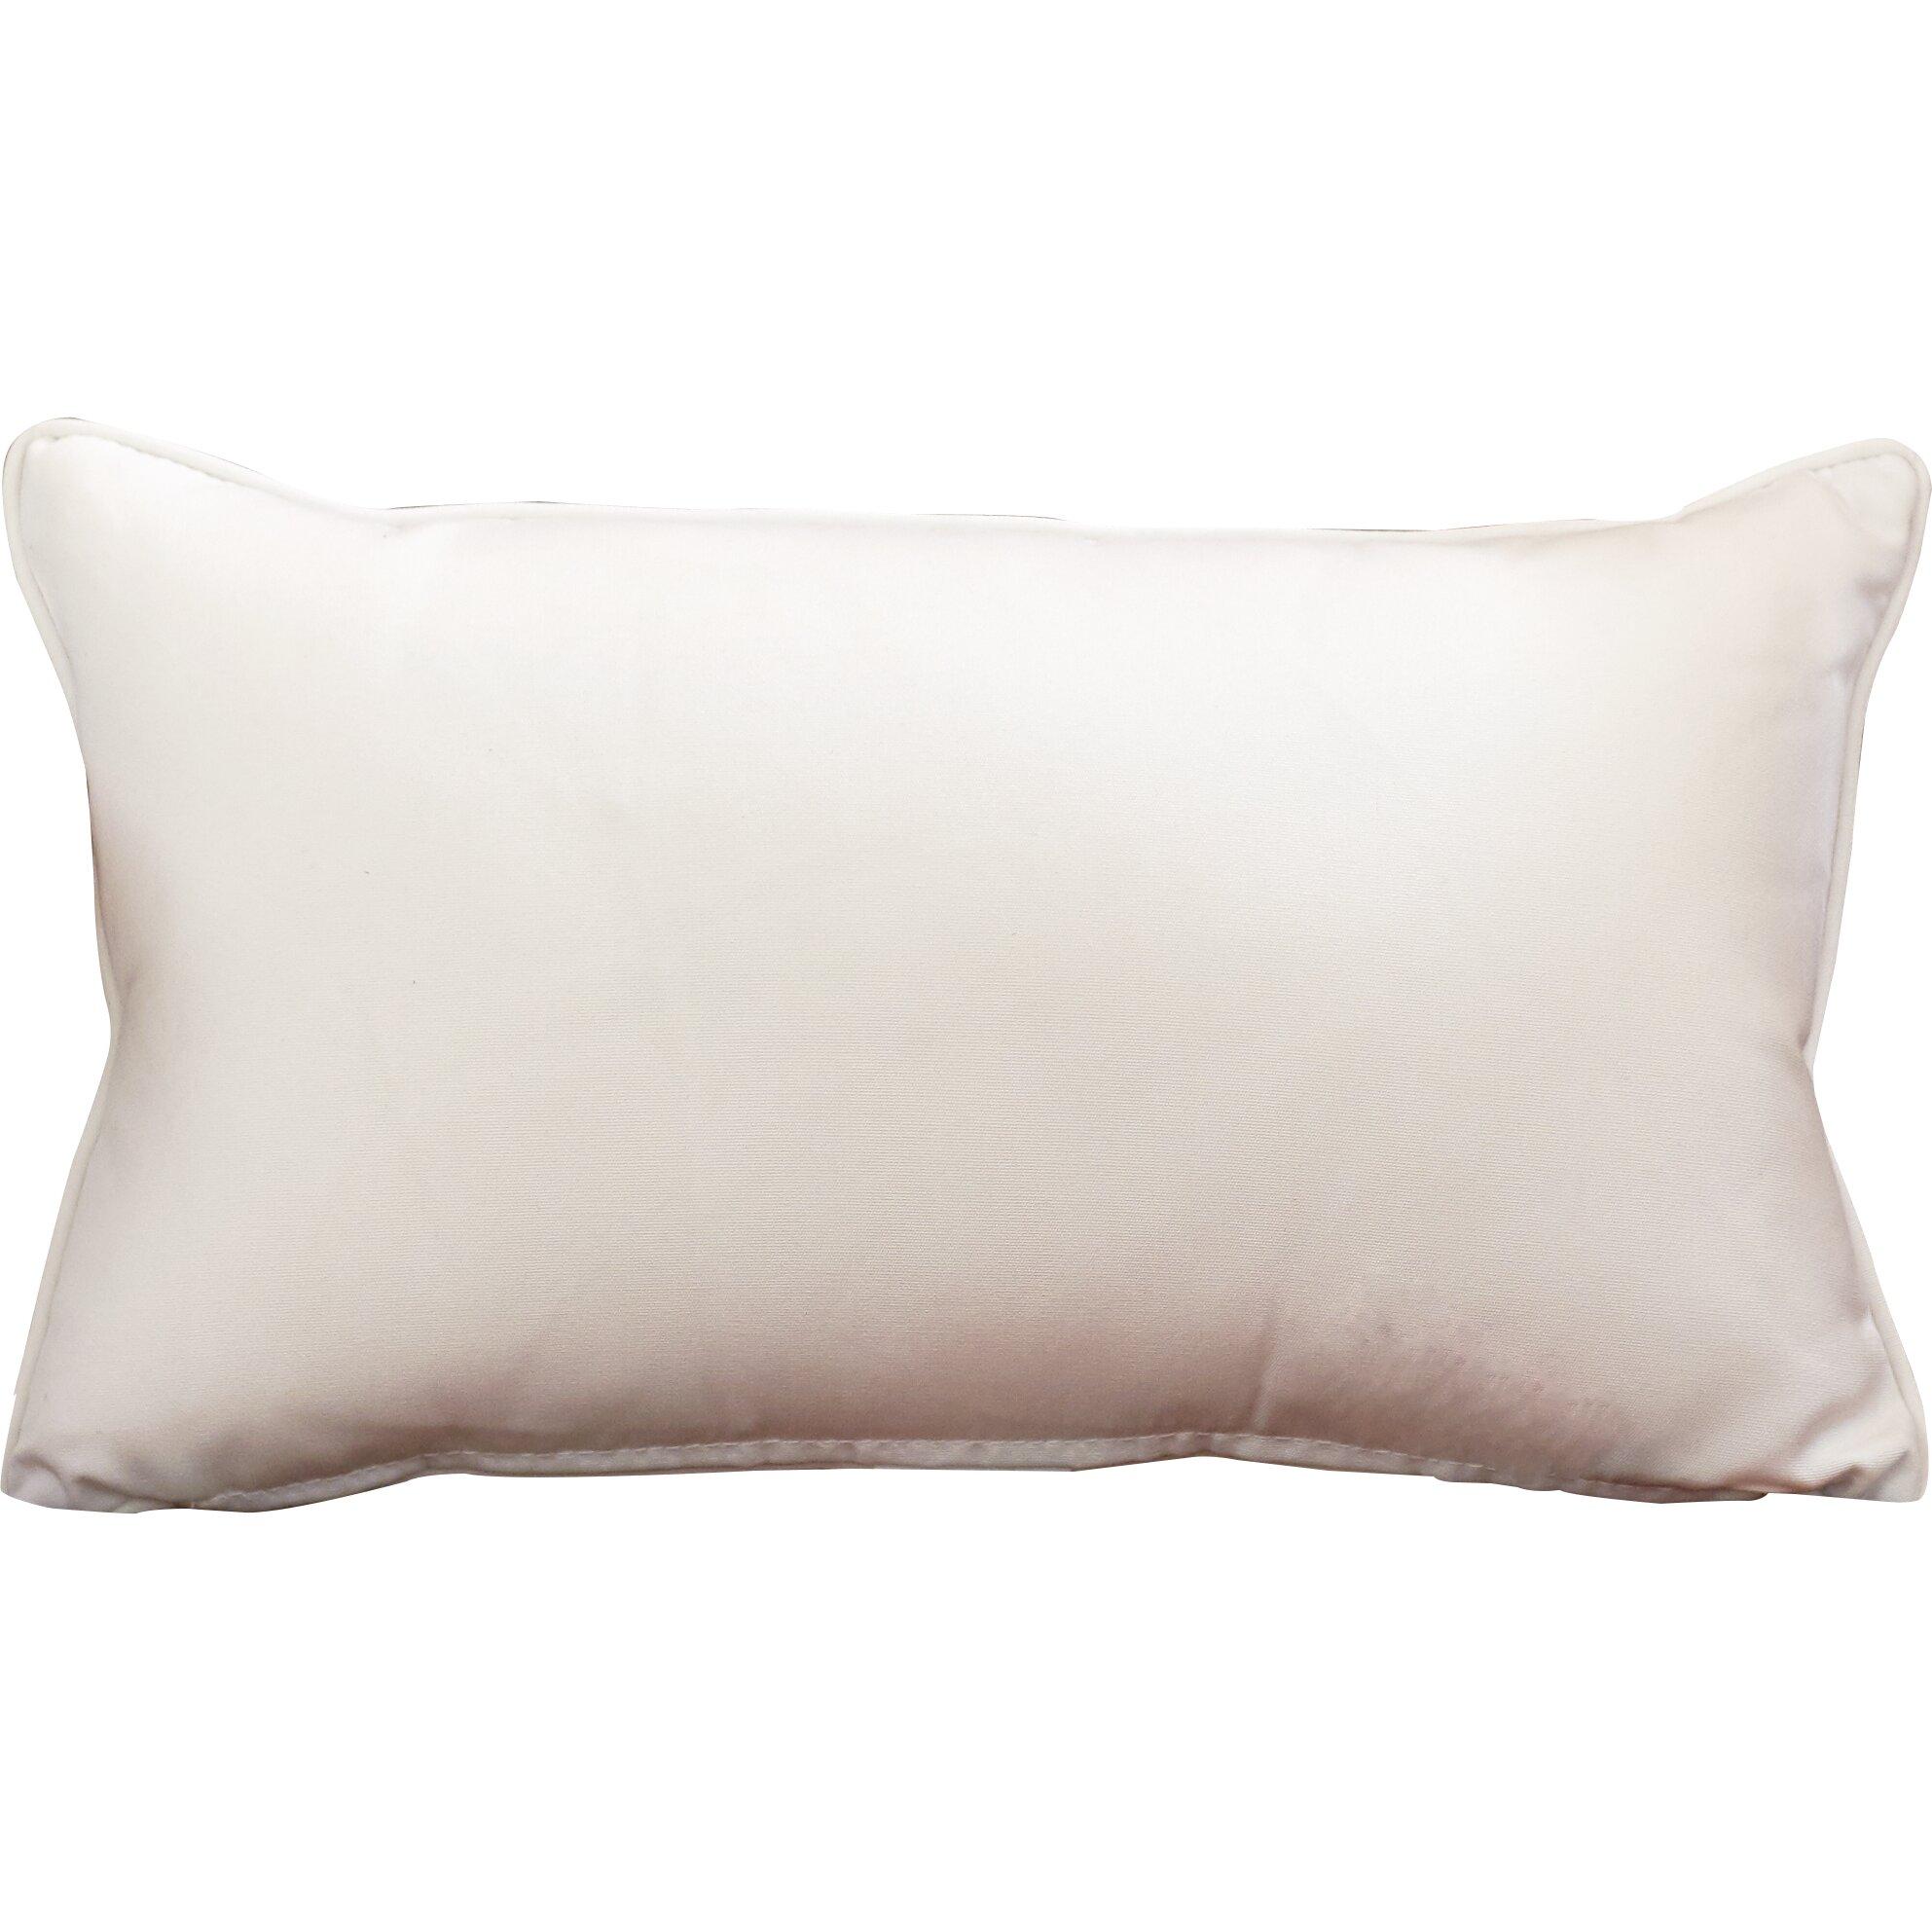 Wayfair Custom Outdoor Cushions Outdoor Sunbrella Lumbar